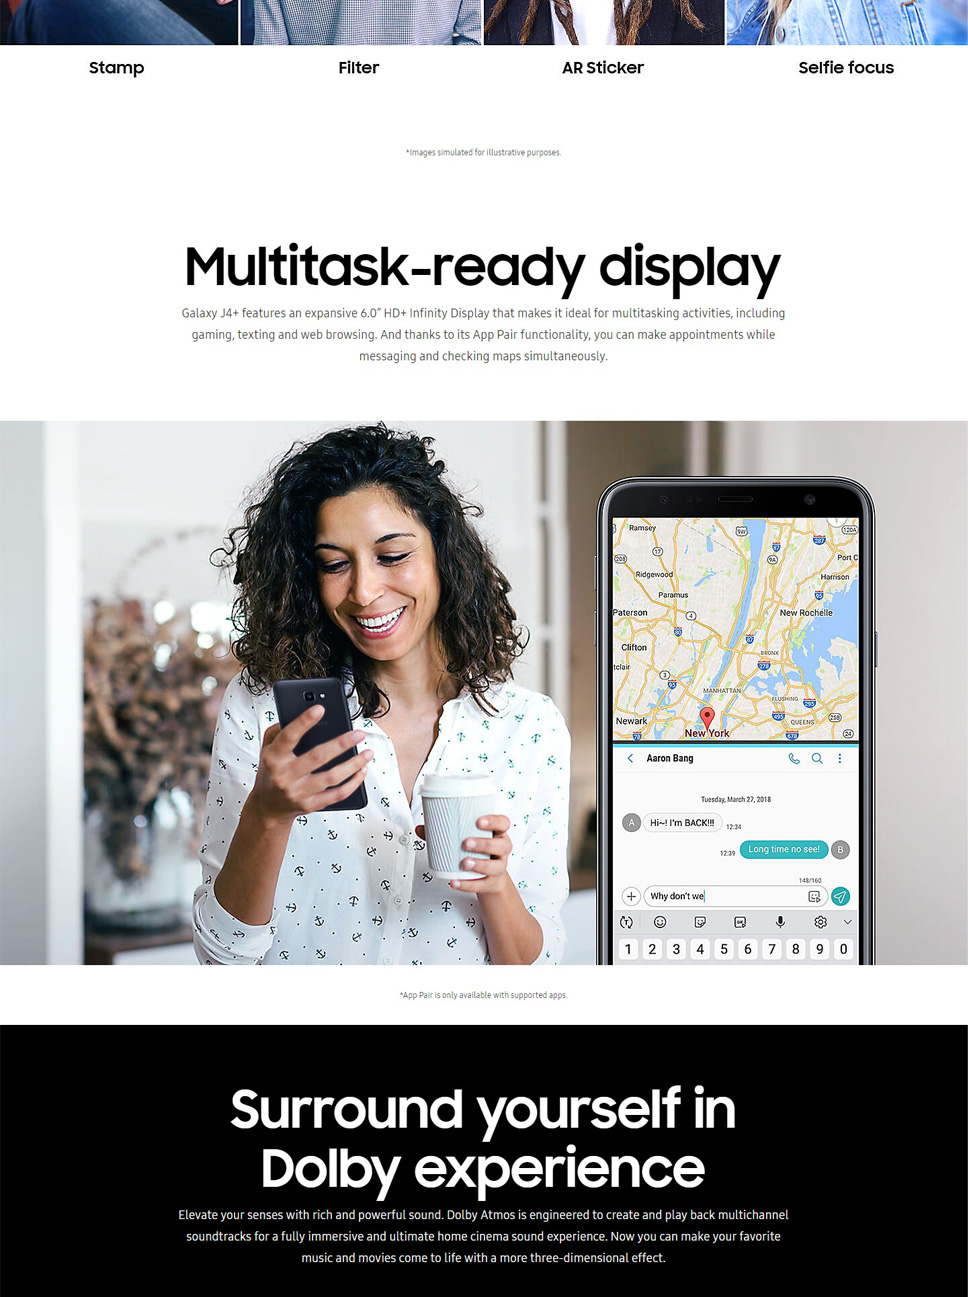 Samsung Galaxy J4 Plus J415GN/DS 6 0'' Smart Phone 3GB RAM 32GB ROM Quad  Core Dual SIM Cards With 3300mAh Battery